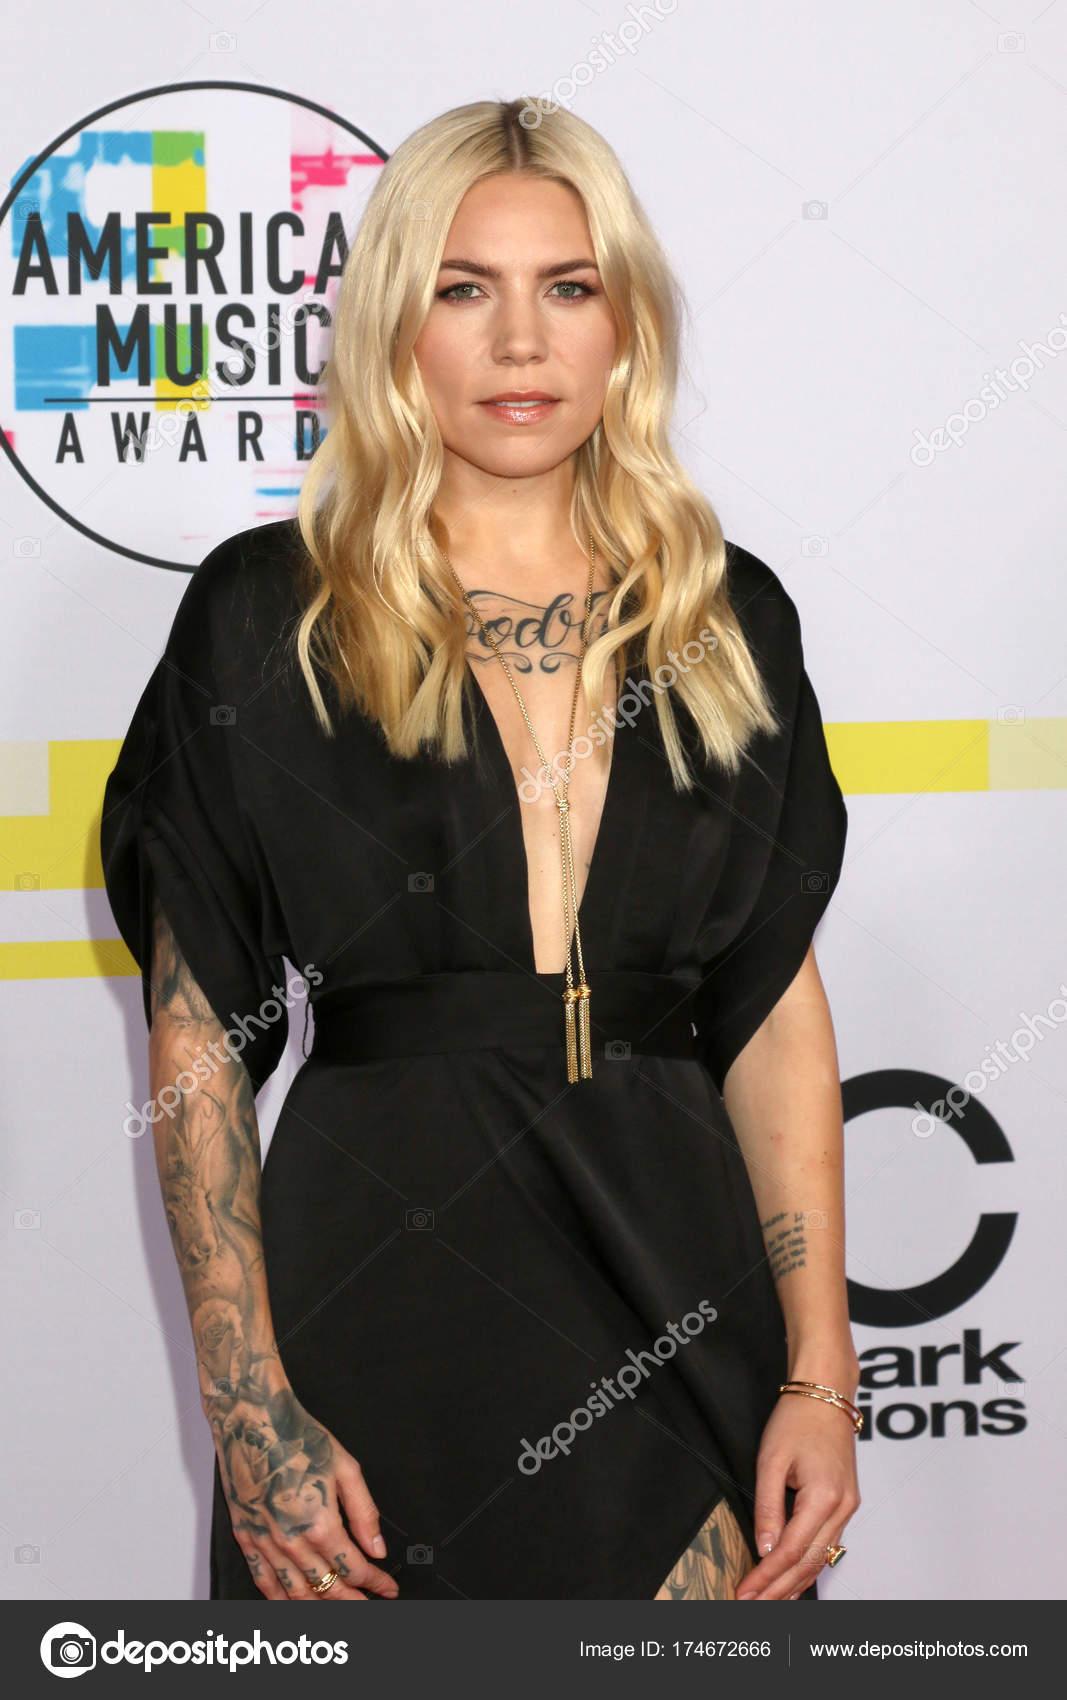 American Music Awards Microsoft